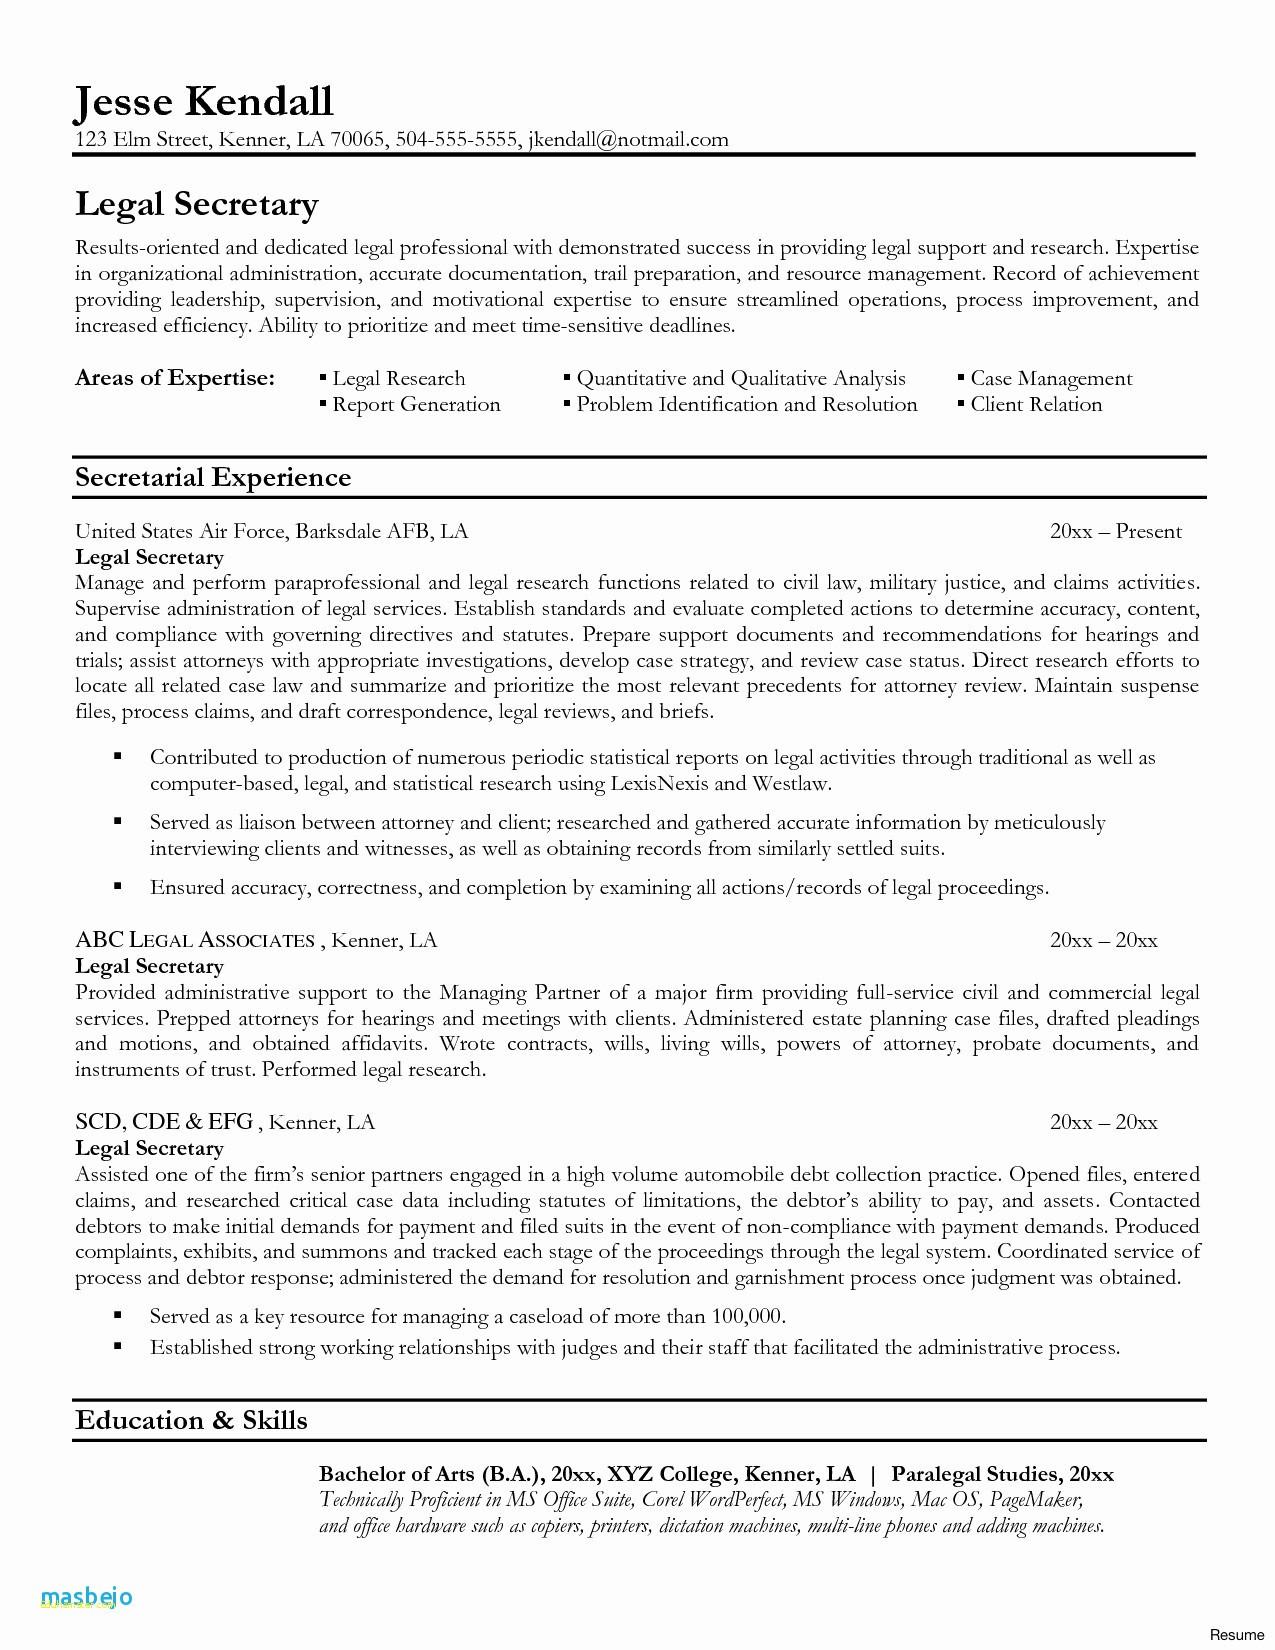 013 Copyright Laws In Education Best Of Unique Life Essays Impressive Essay Examples 2012 Full